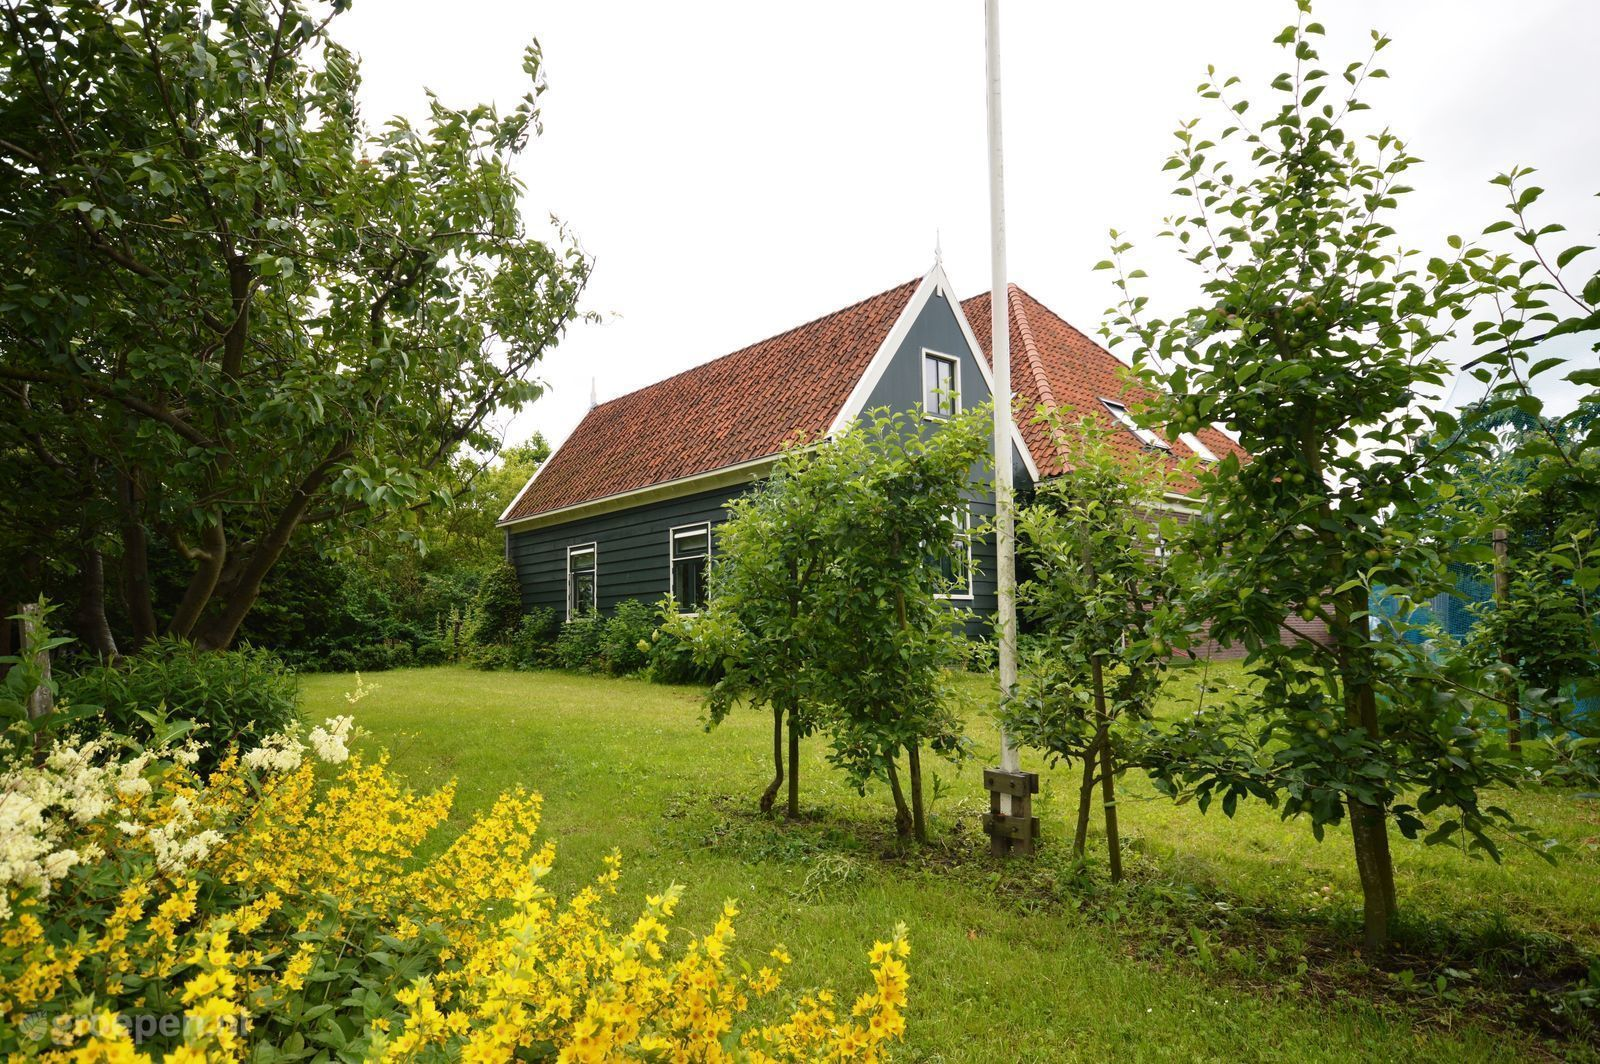 Zuidoostbeemster Zob 879 18 Guests North Holland Netherlands